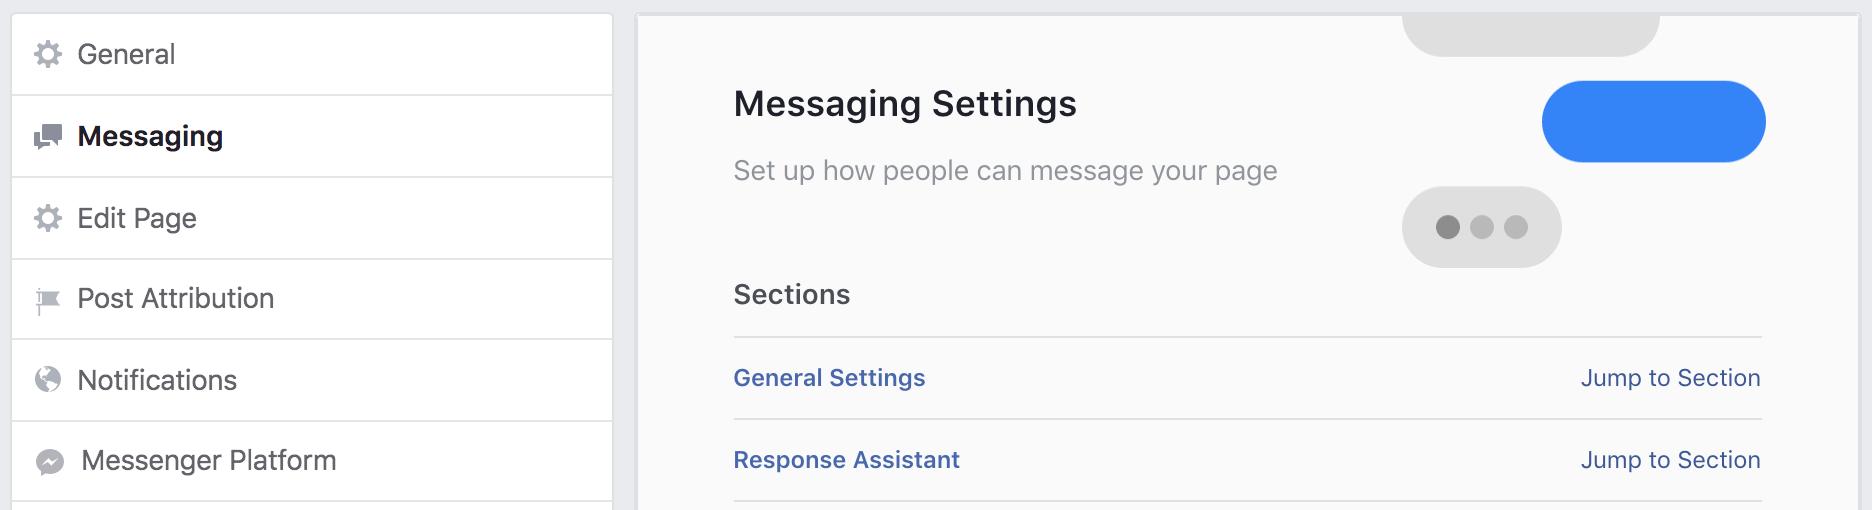 fb page settings > messaging settings